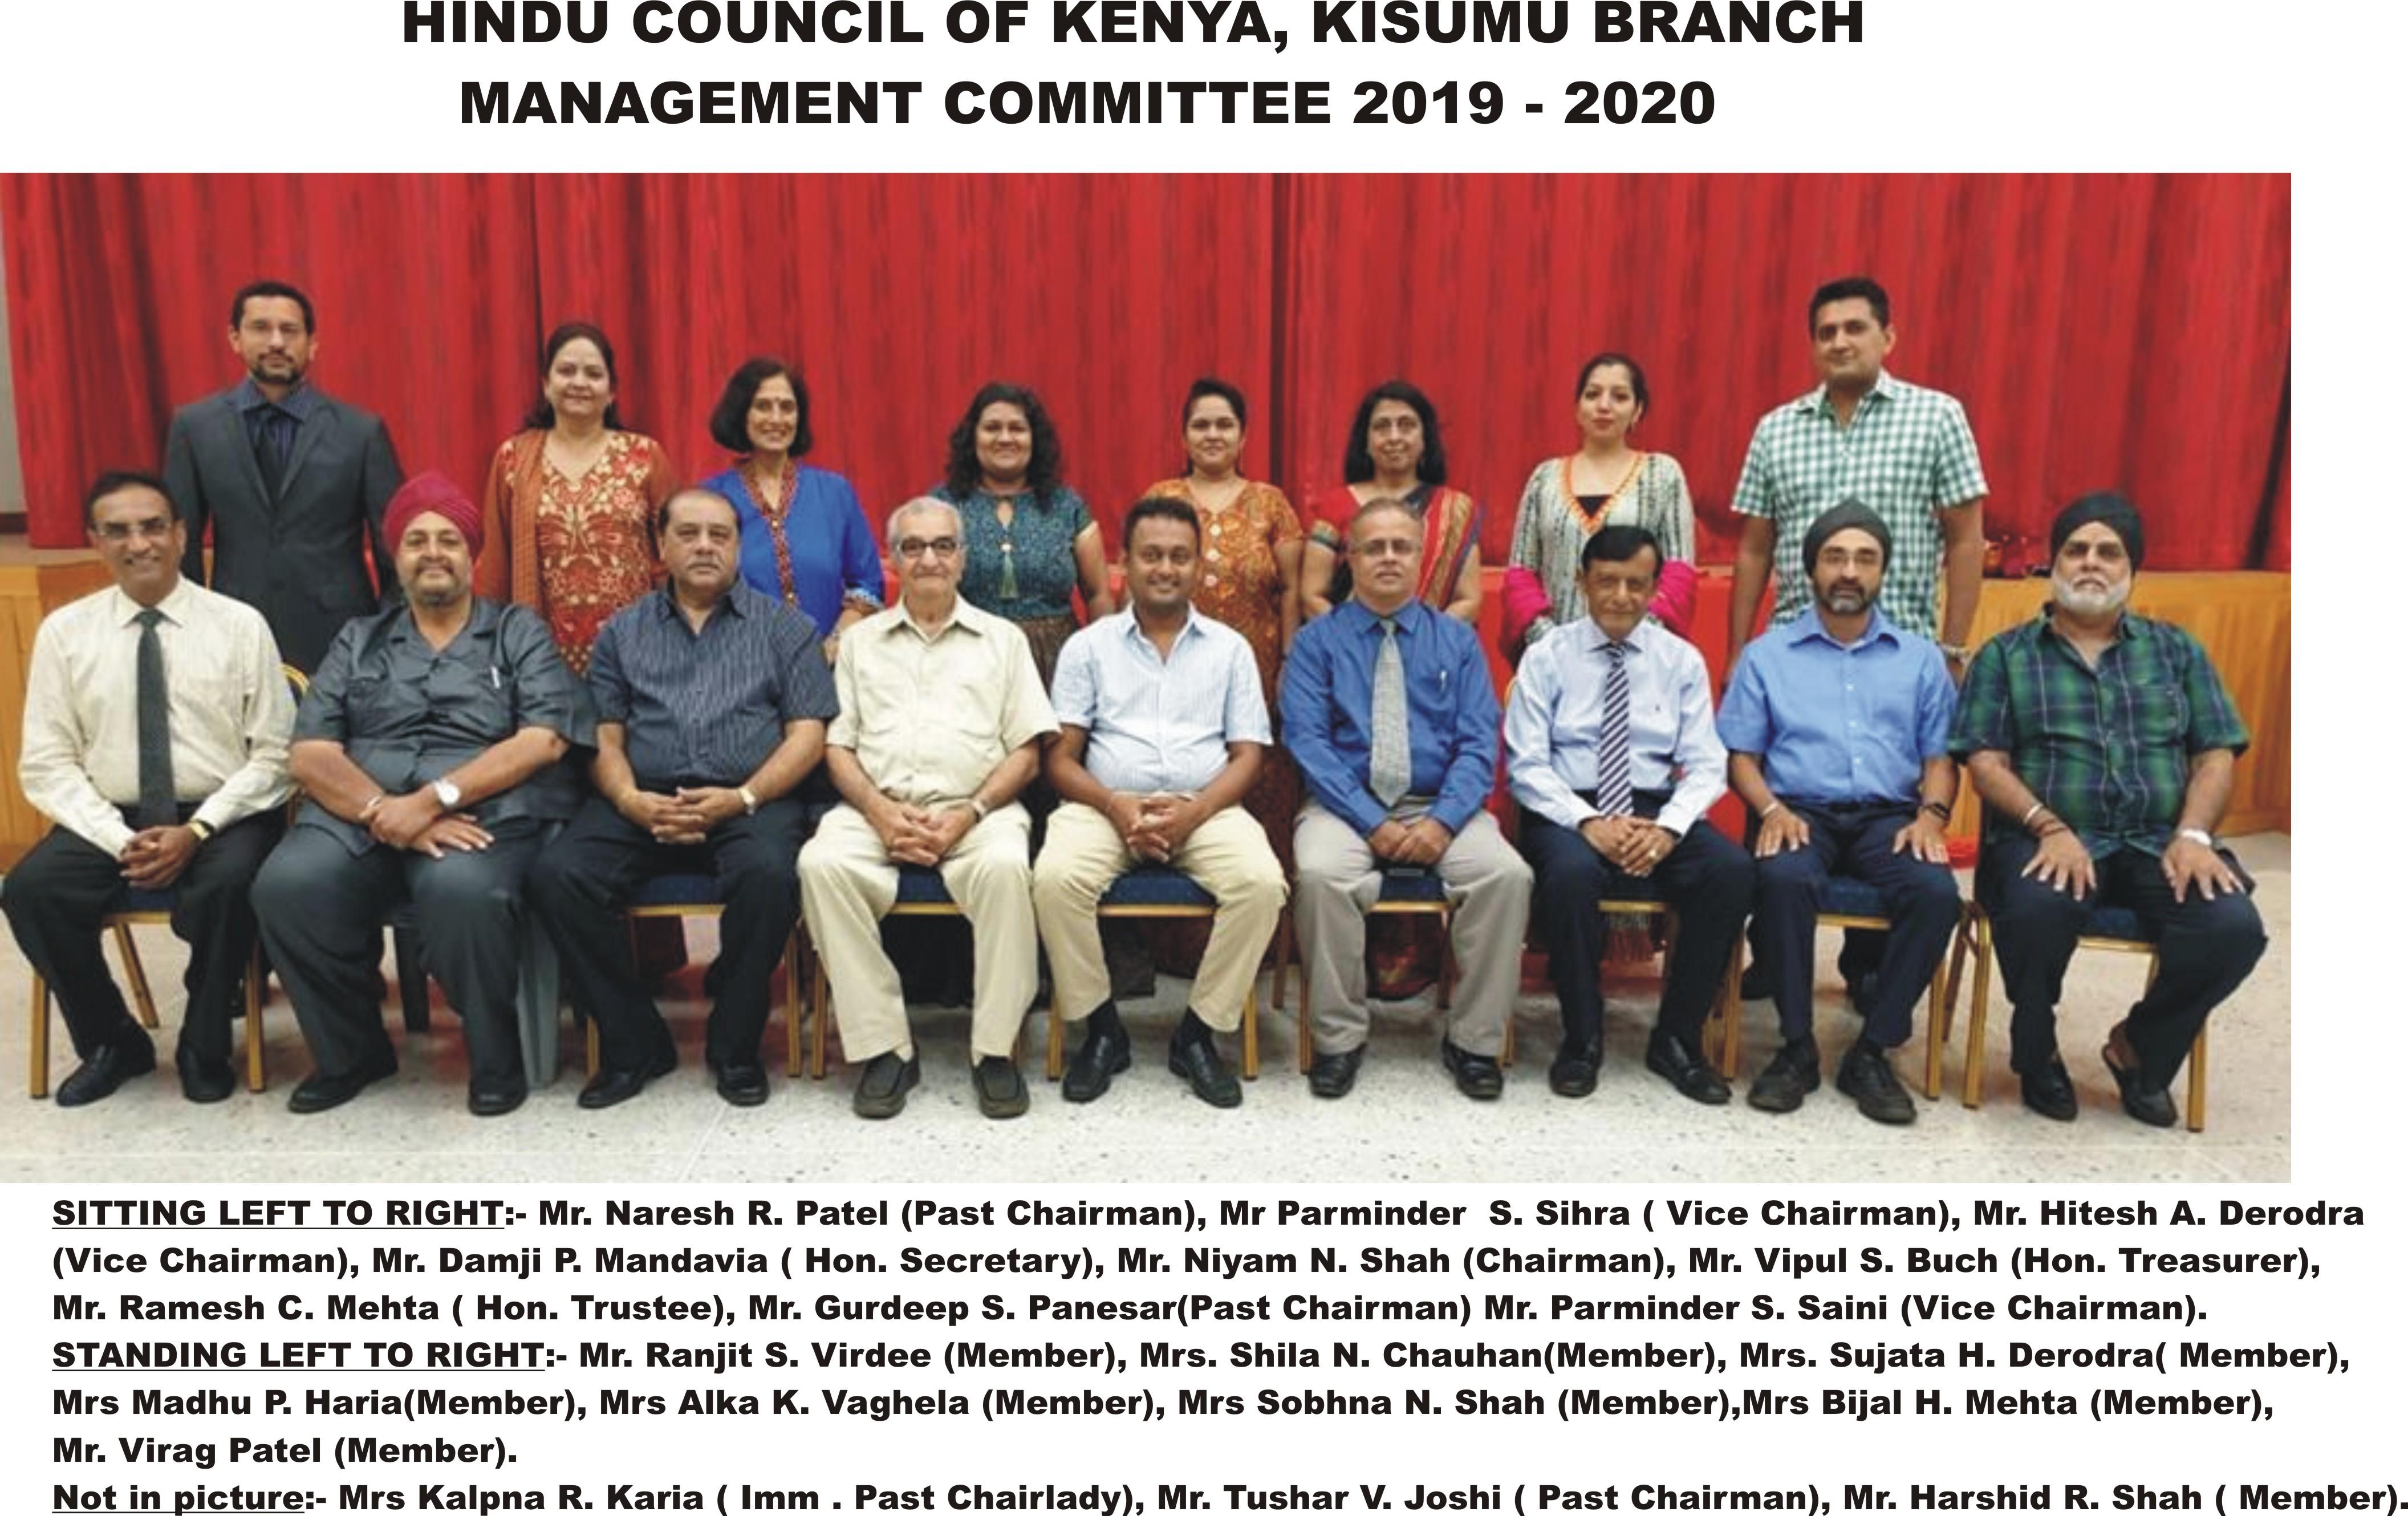 HCK Kisumu committee 2019-2020